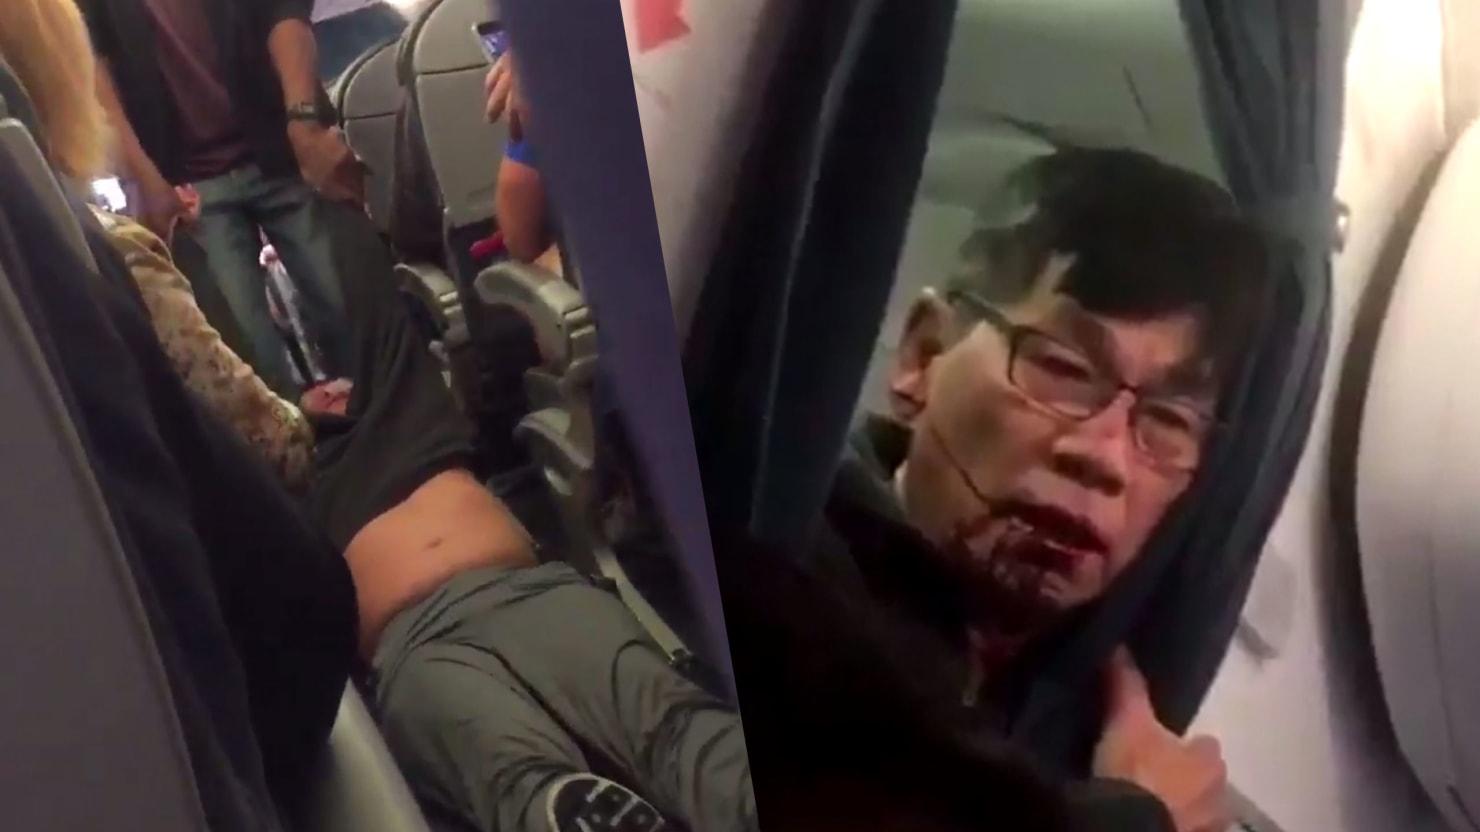 Blame Big Airline Mergers for United's Shocking Passenger